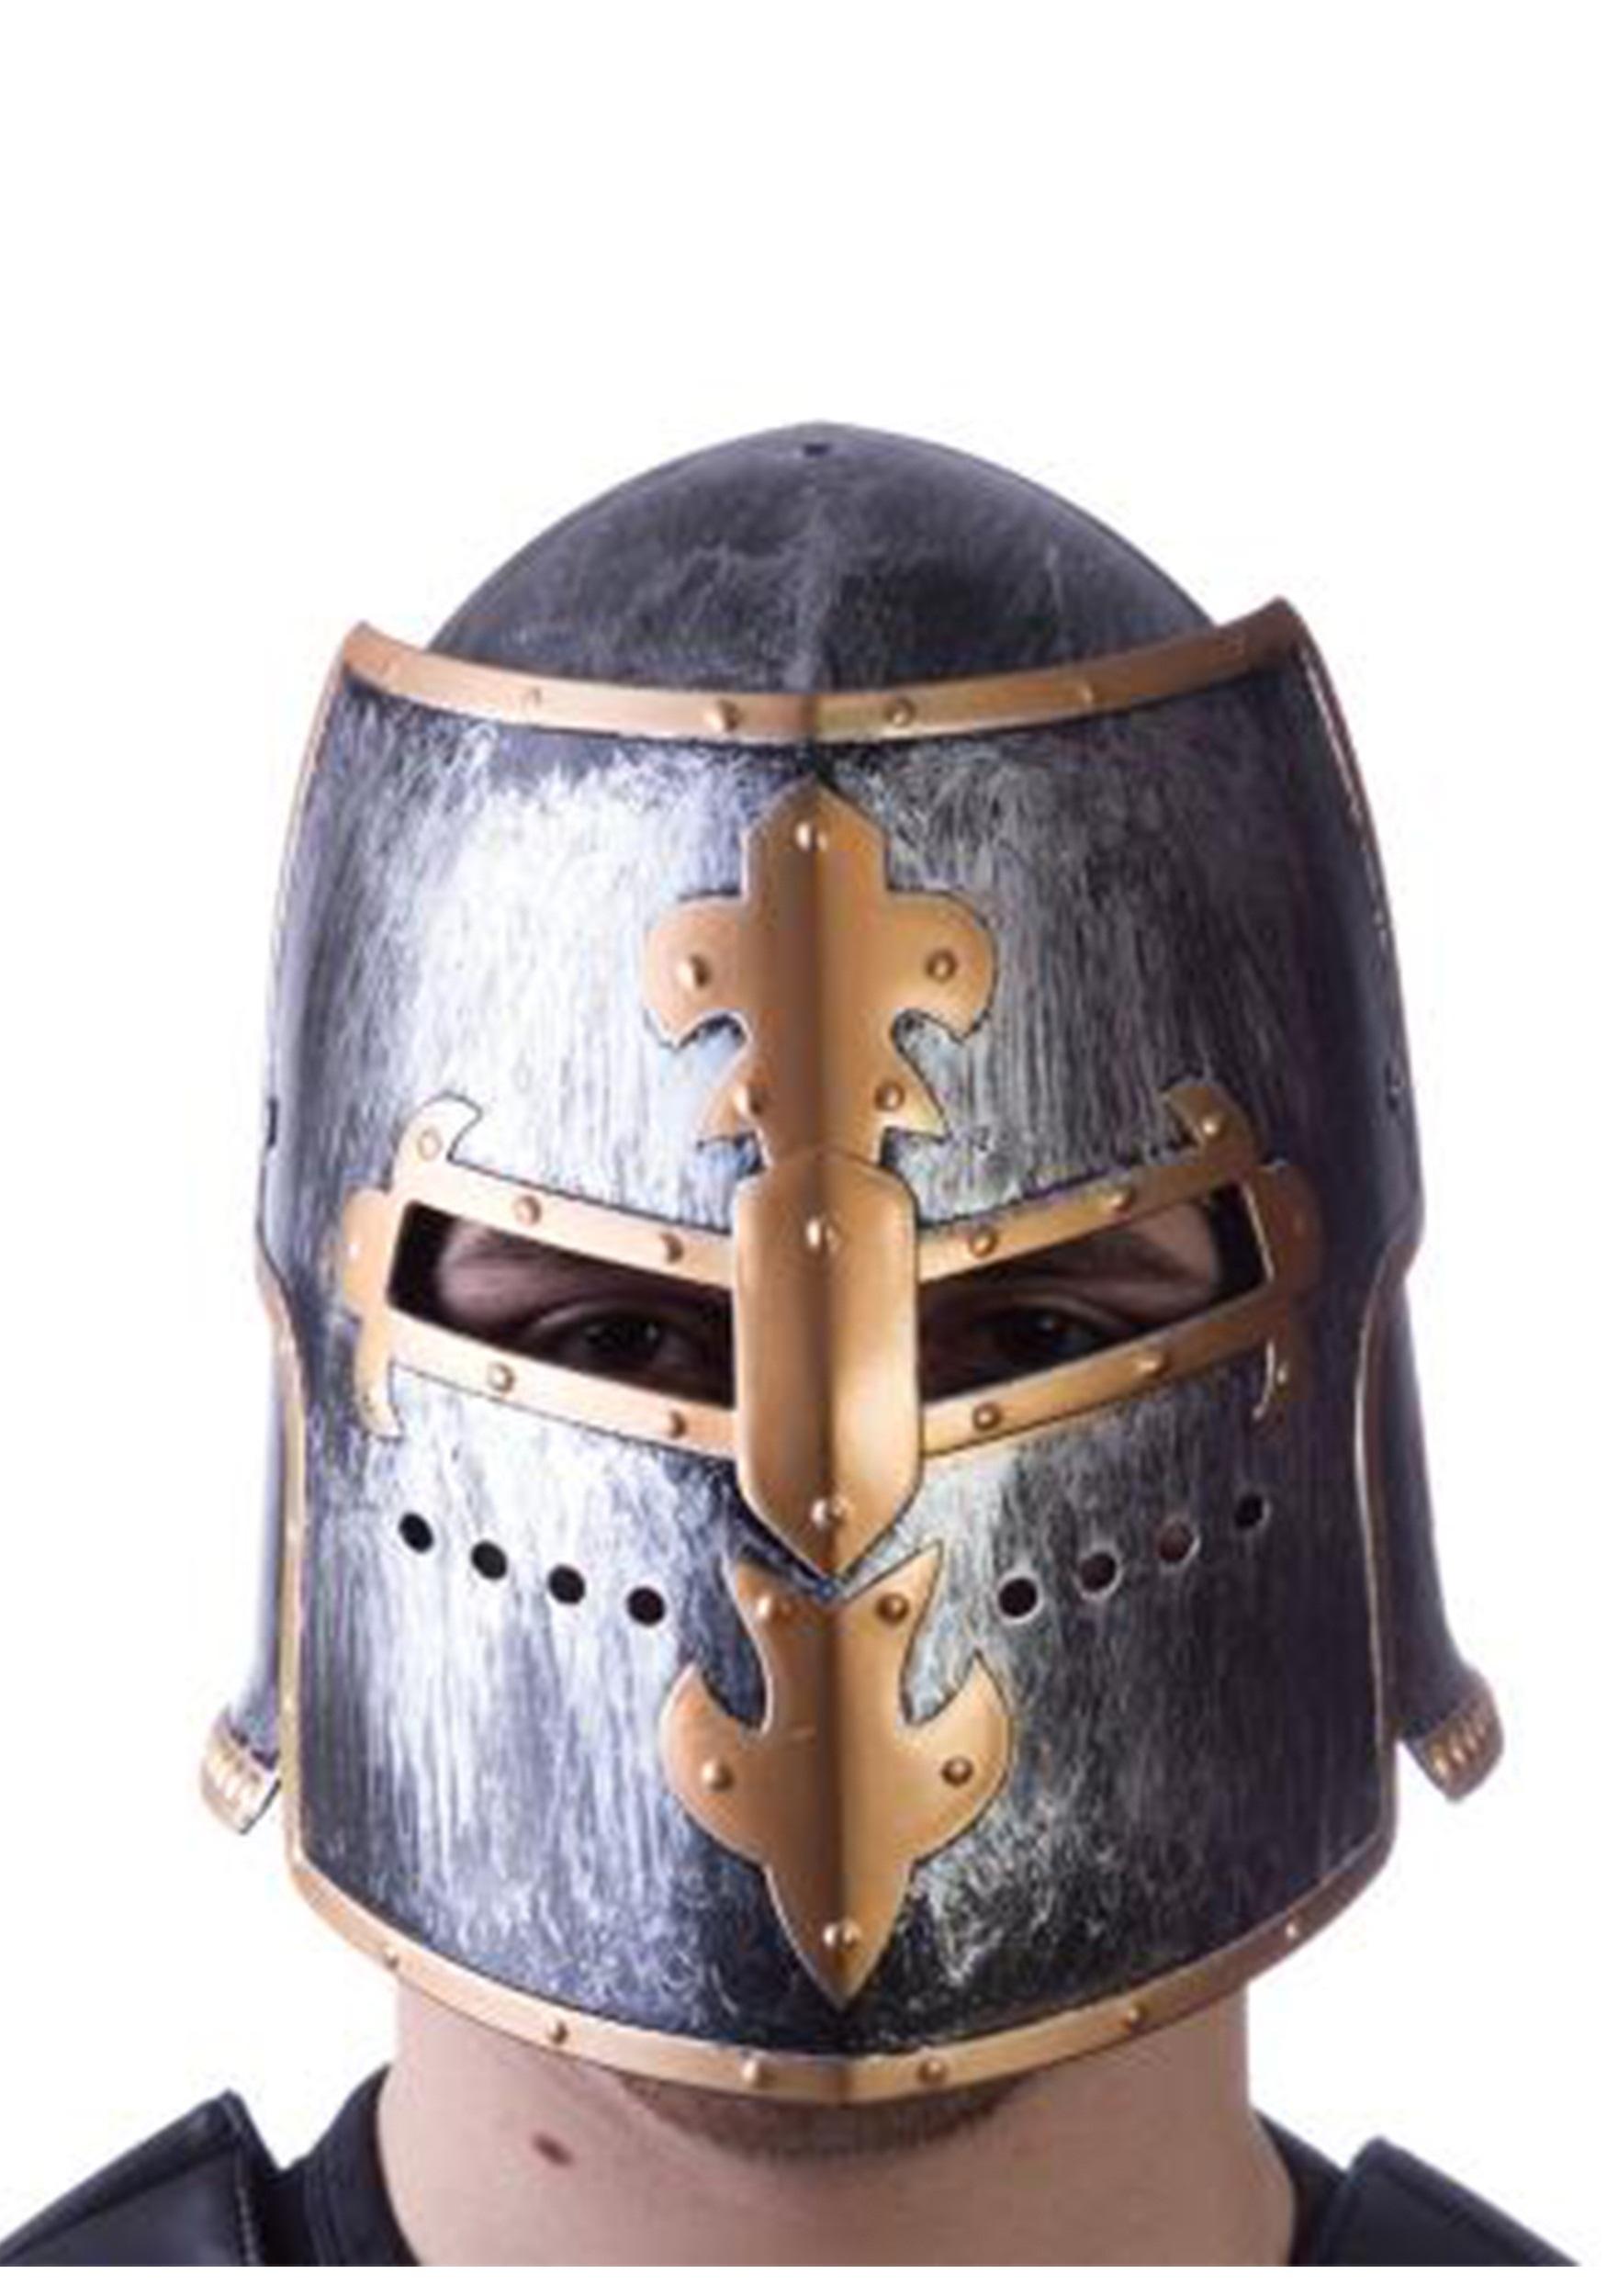 e0794b730a27a Adult Adjustable Medieval Helmet